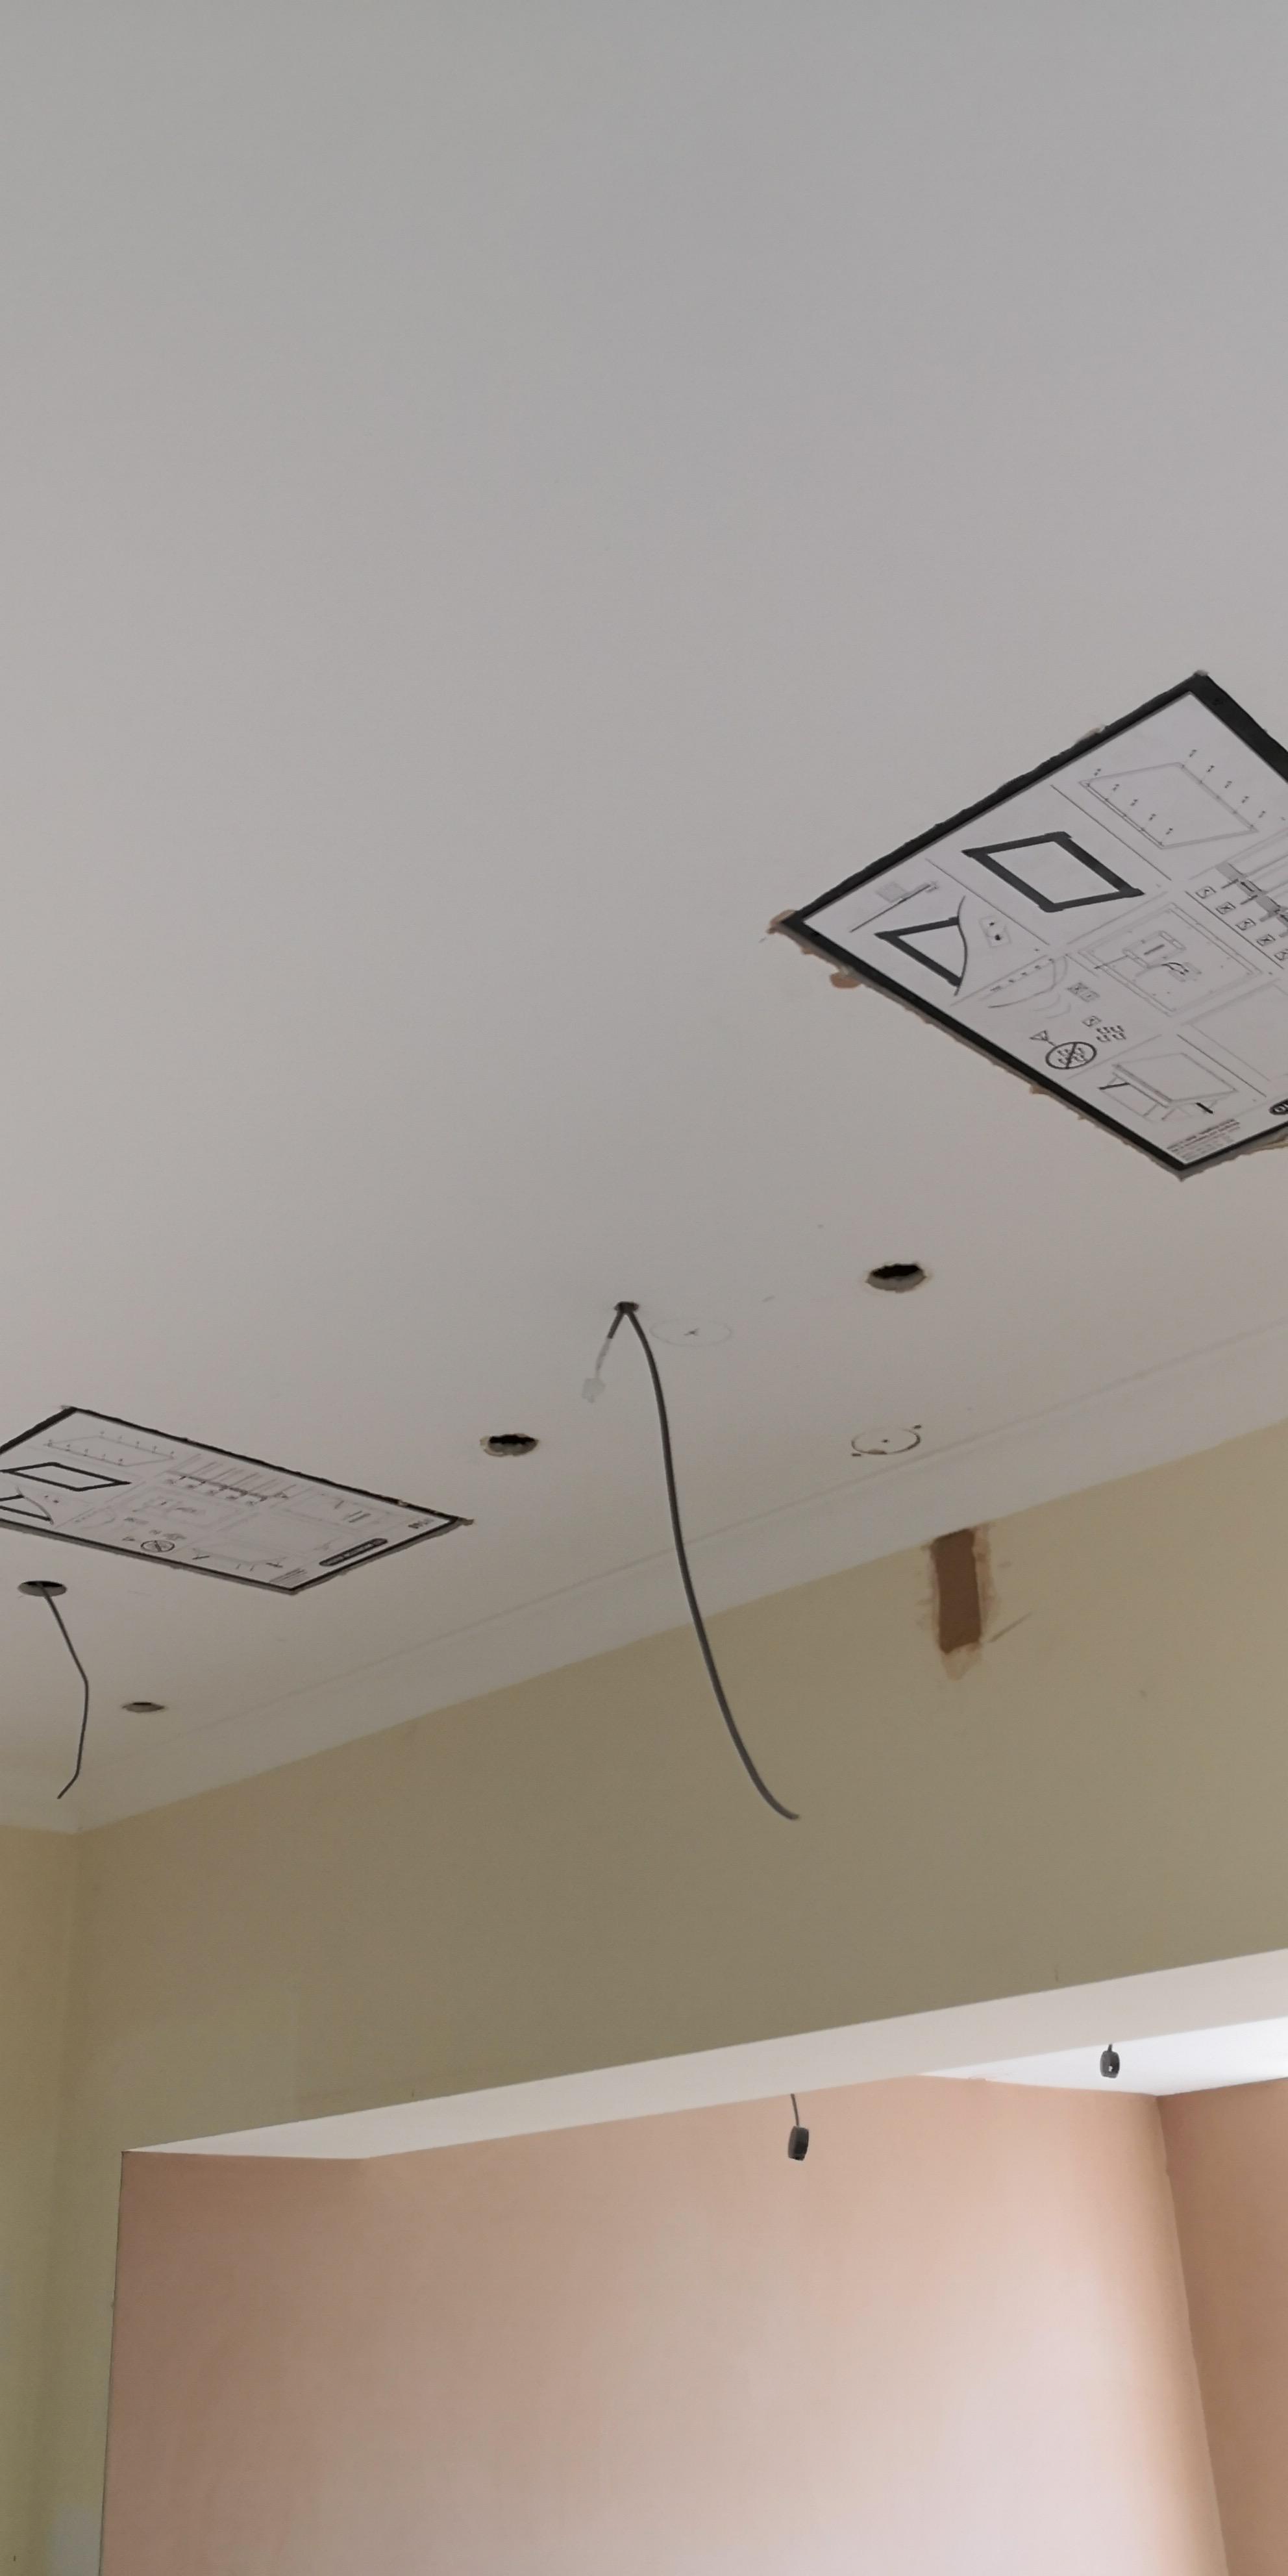 Plaster in speakers